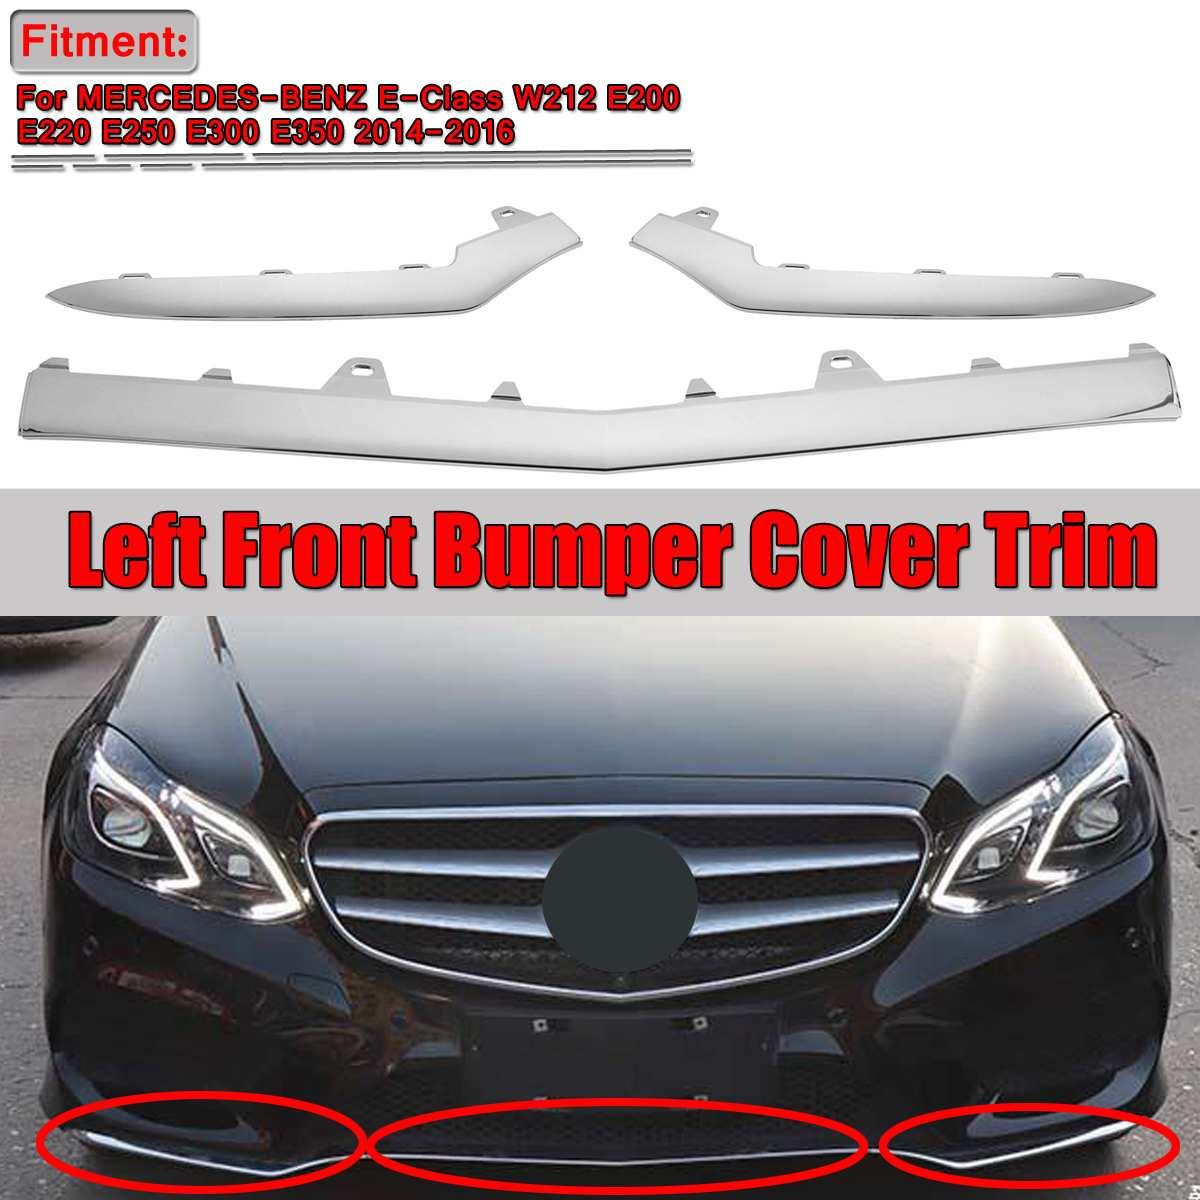 For Mercedes W212 E350 E63 AMG Rear Center Bumper Garnish Moulding Chrome Strip